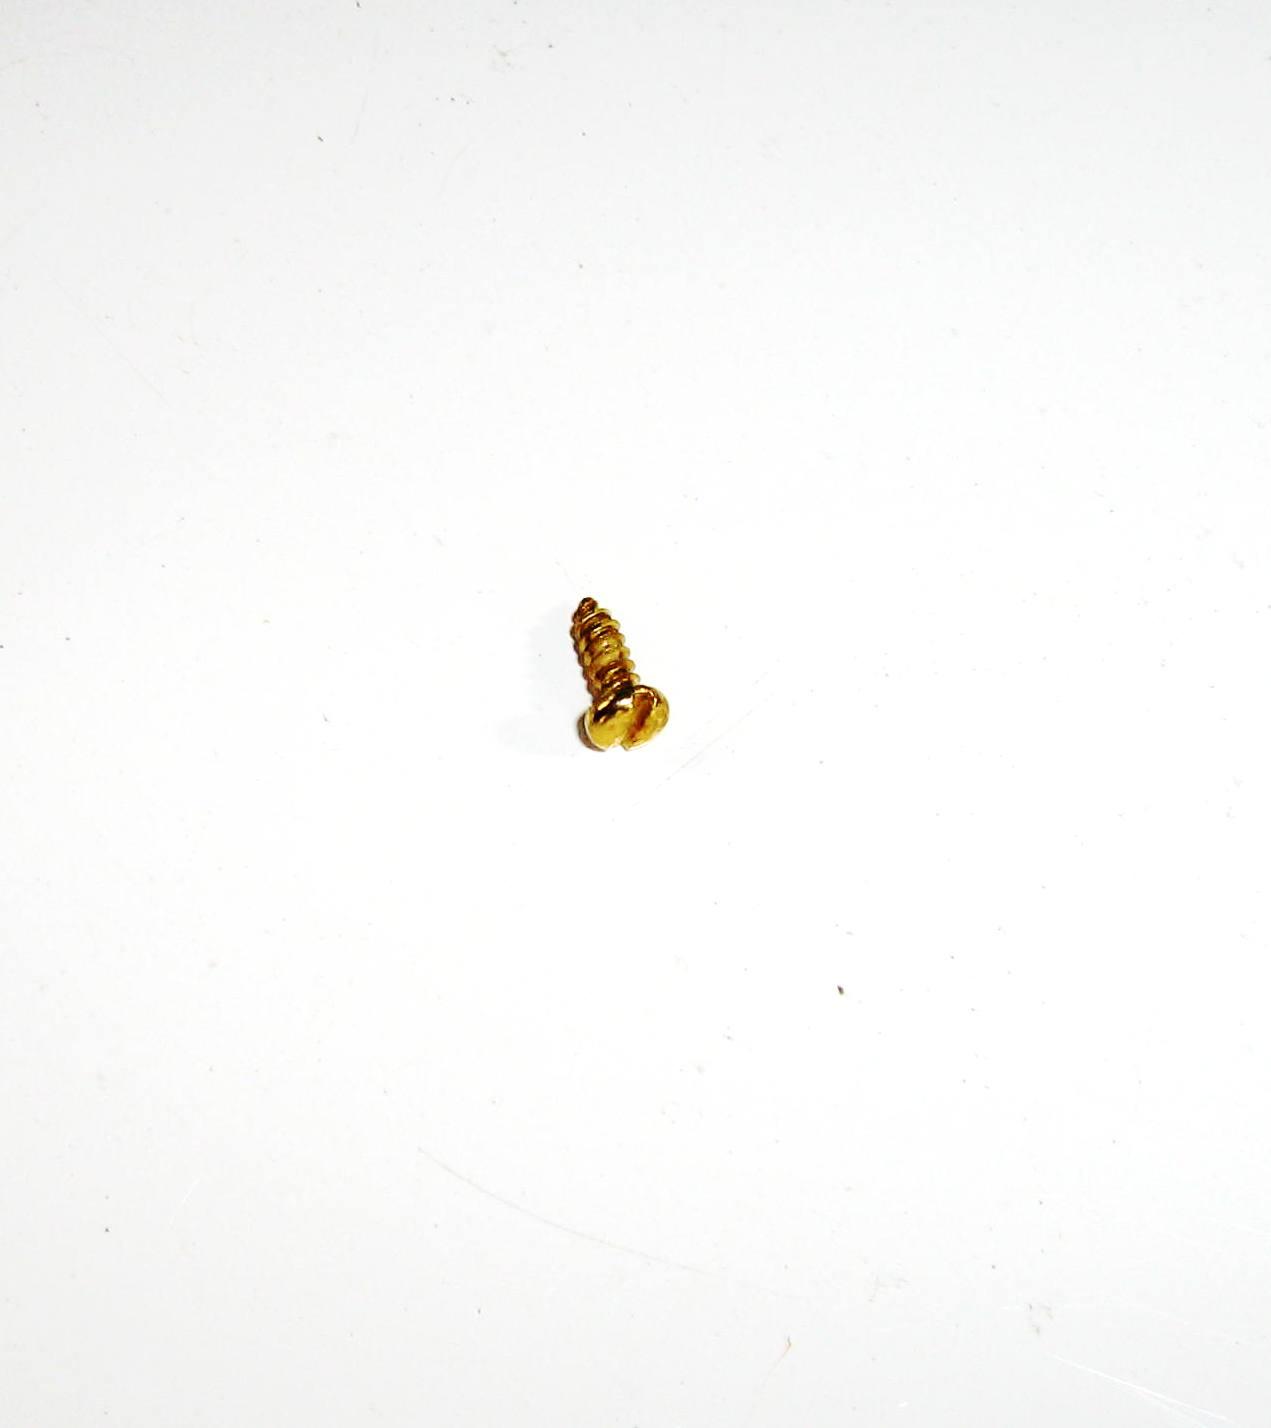 Fixador Fenda 6,5mm x 2,2mm Cabeça Redonda Latonado